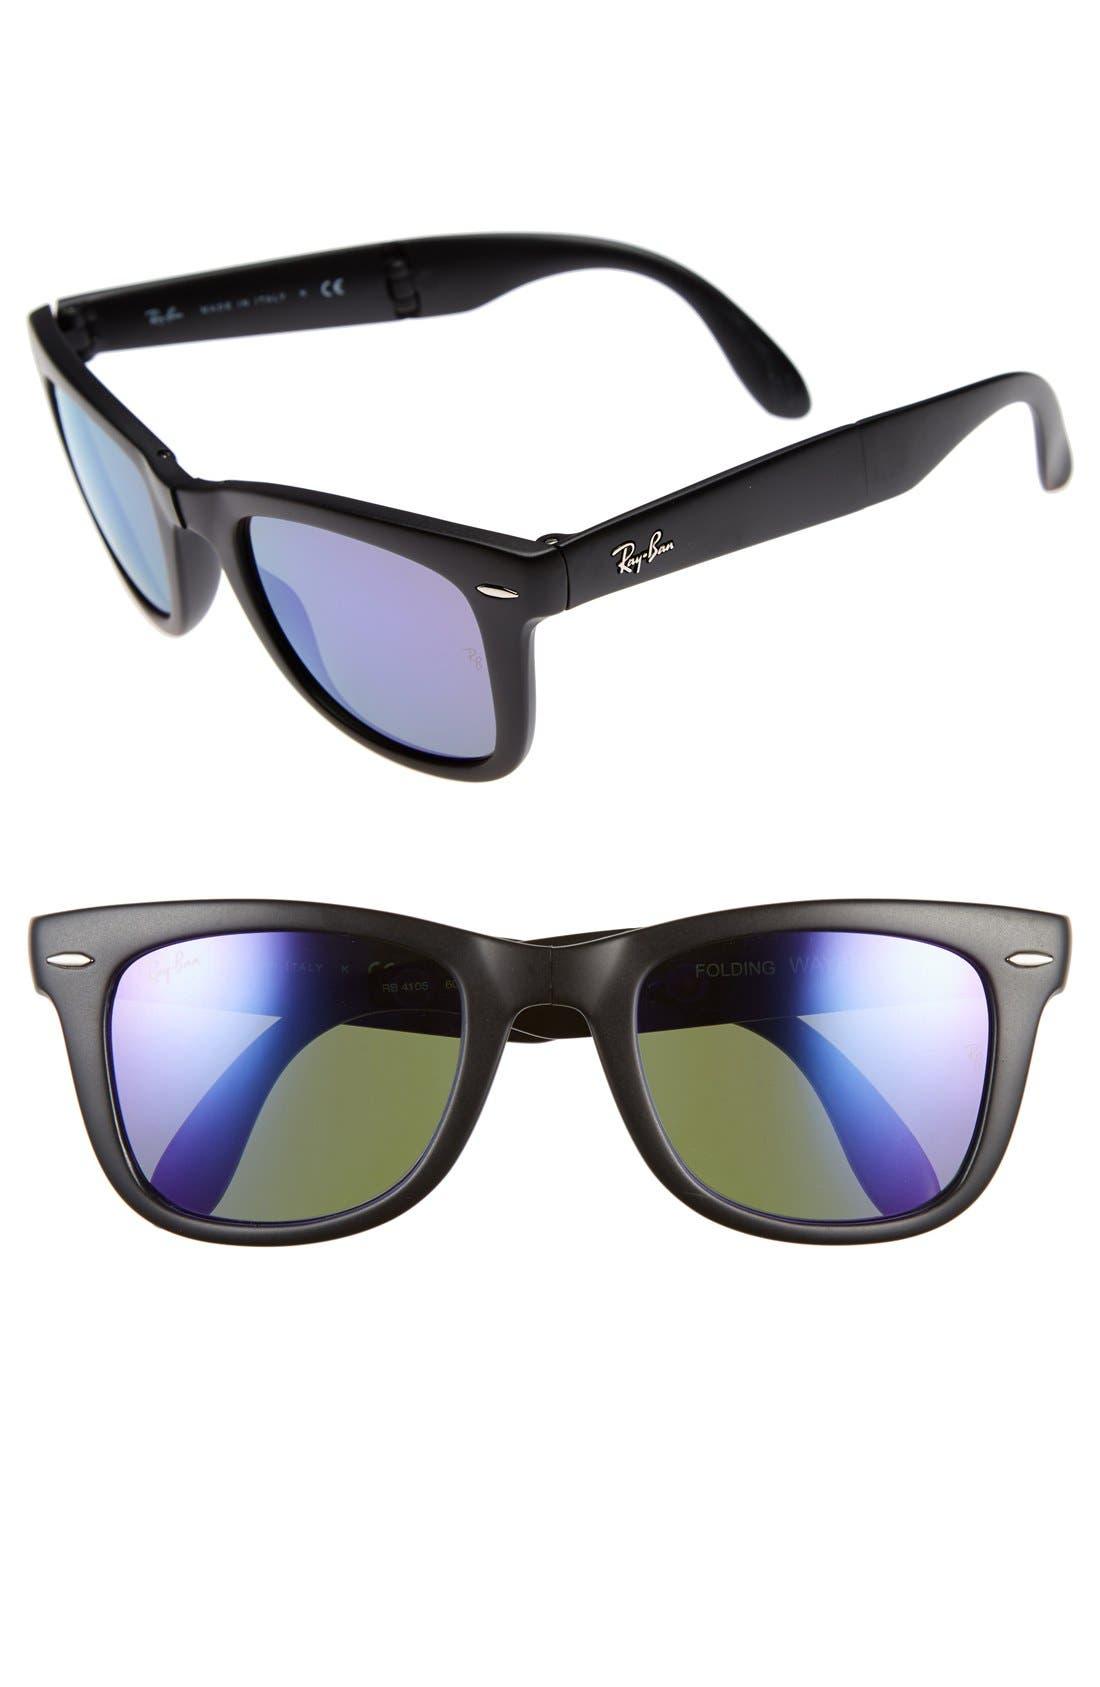 Alternate Image 1 Selected - Ray-Ban 'Folding Wayfarer' 50mm Sunglasses (Nordstrom Exclusive)